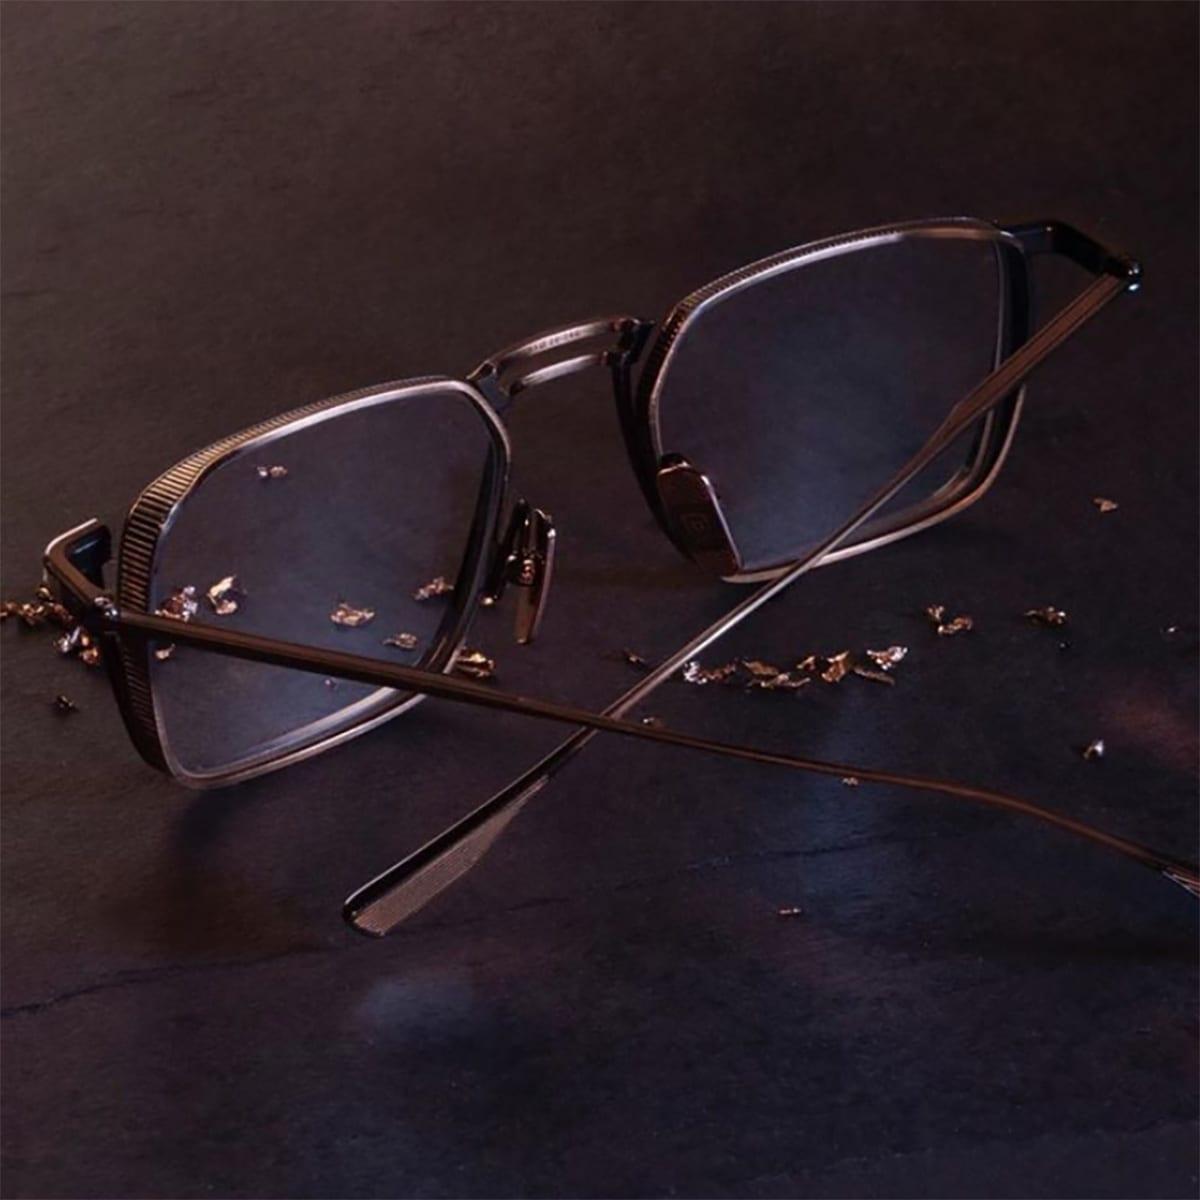 dita-eyewear-stockist-wolverhampton-shropshire-west-midlands-6